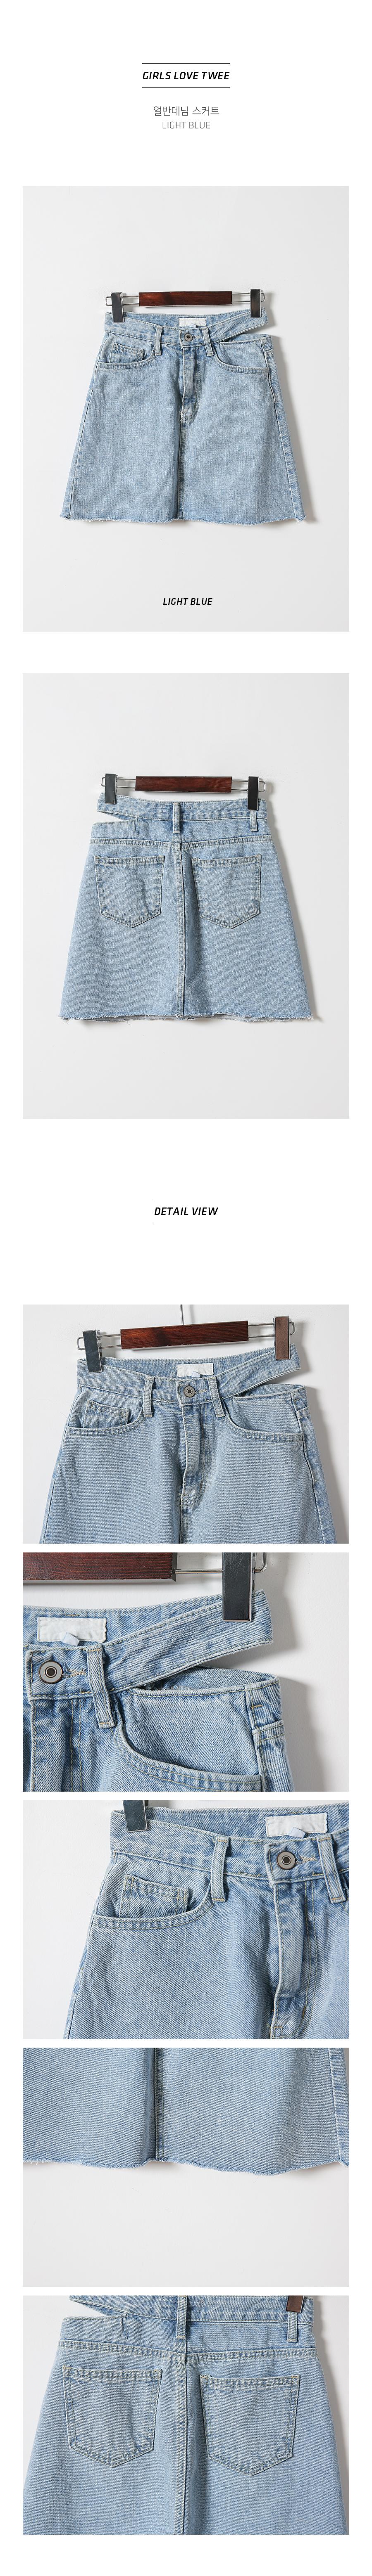 Urban denim skirt